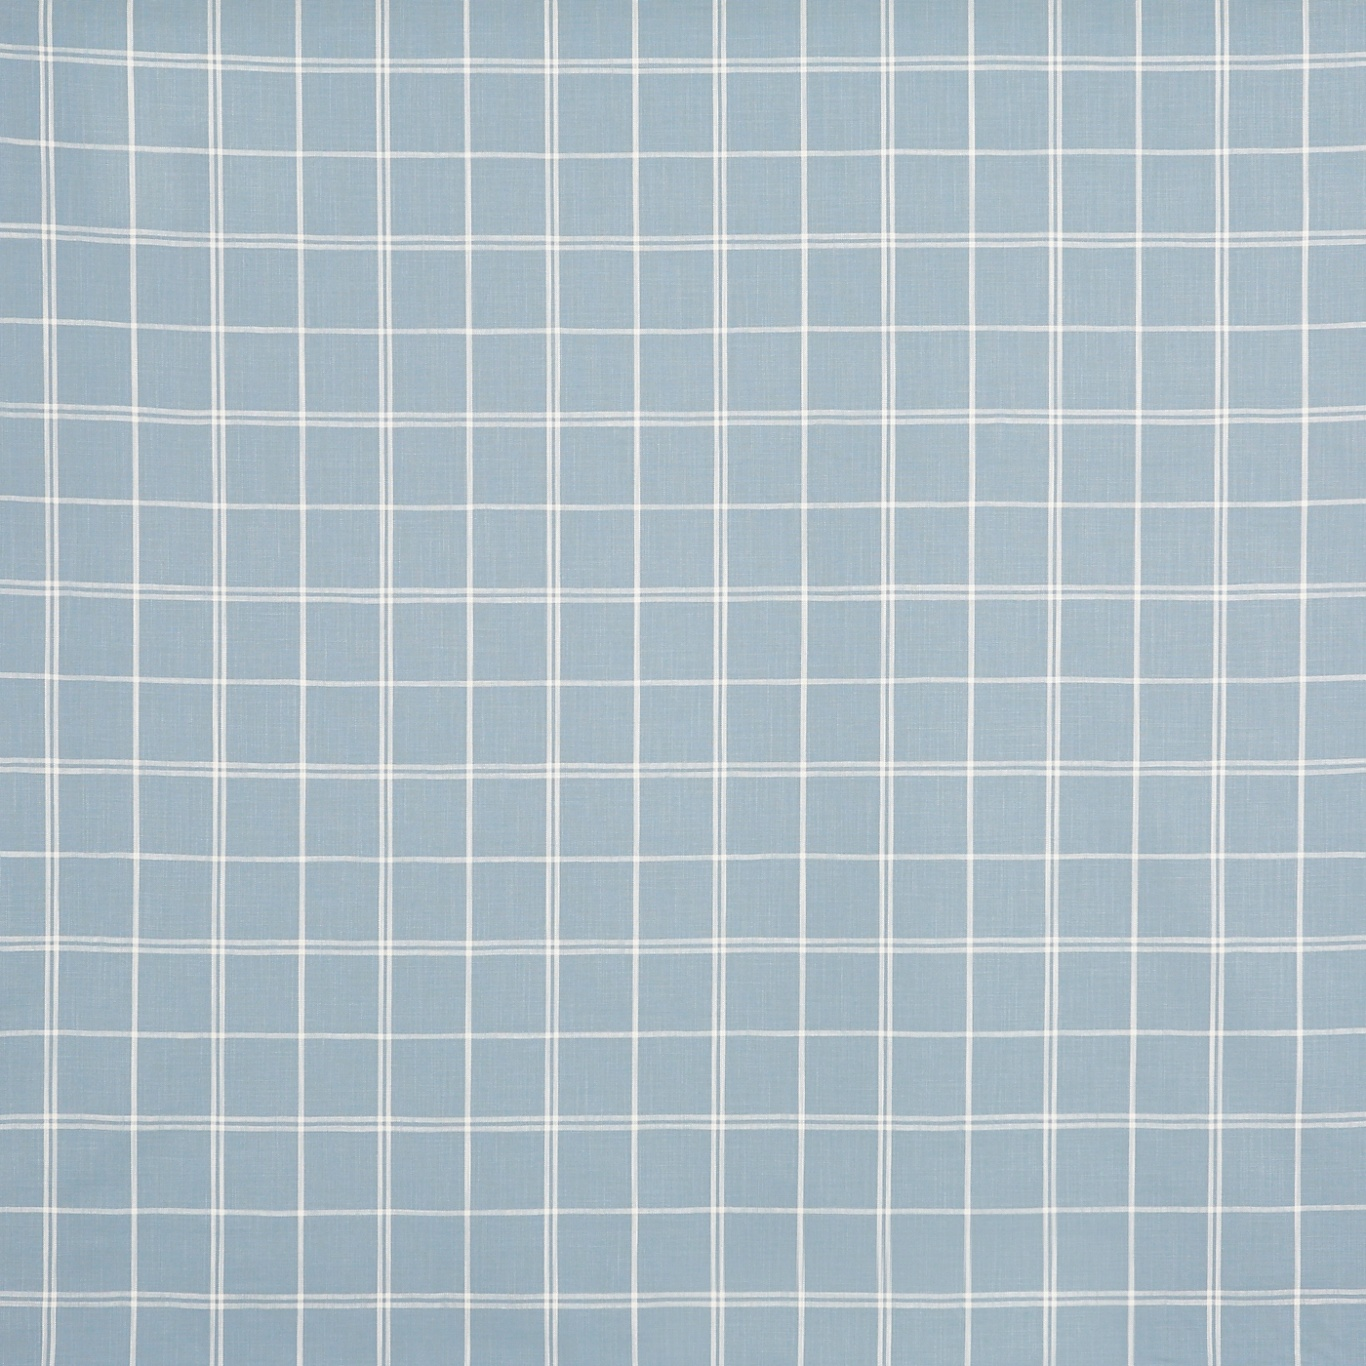 Image of Prestigious Boston Azure Fabric 3814/707